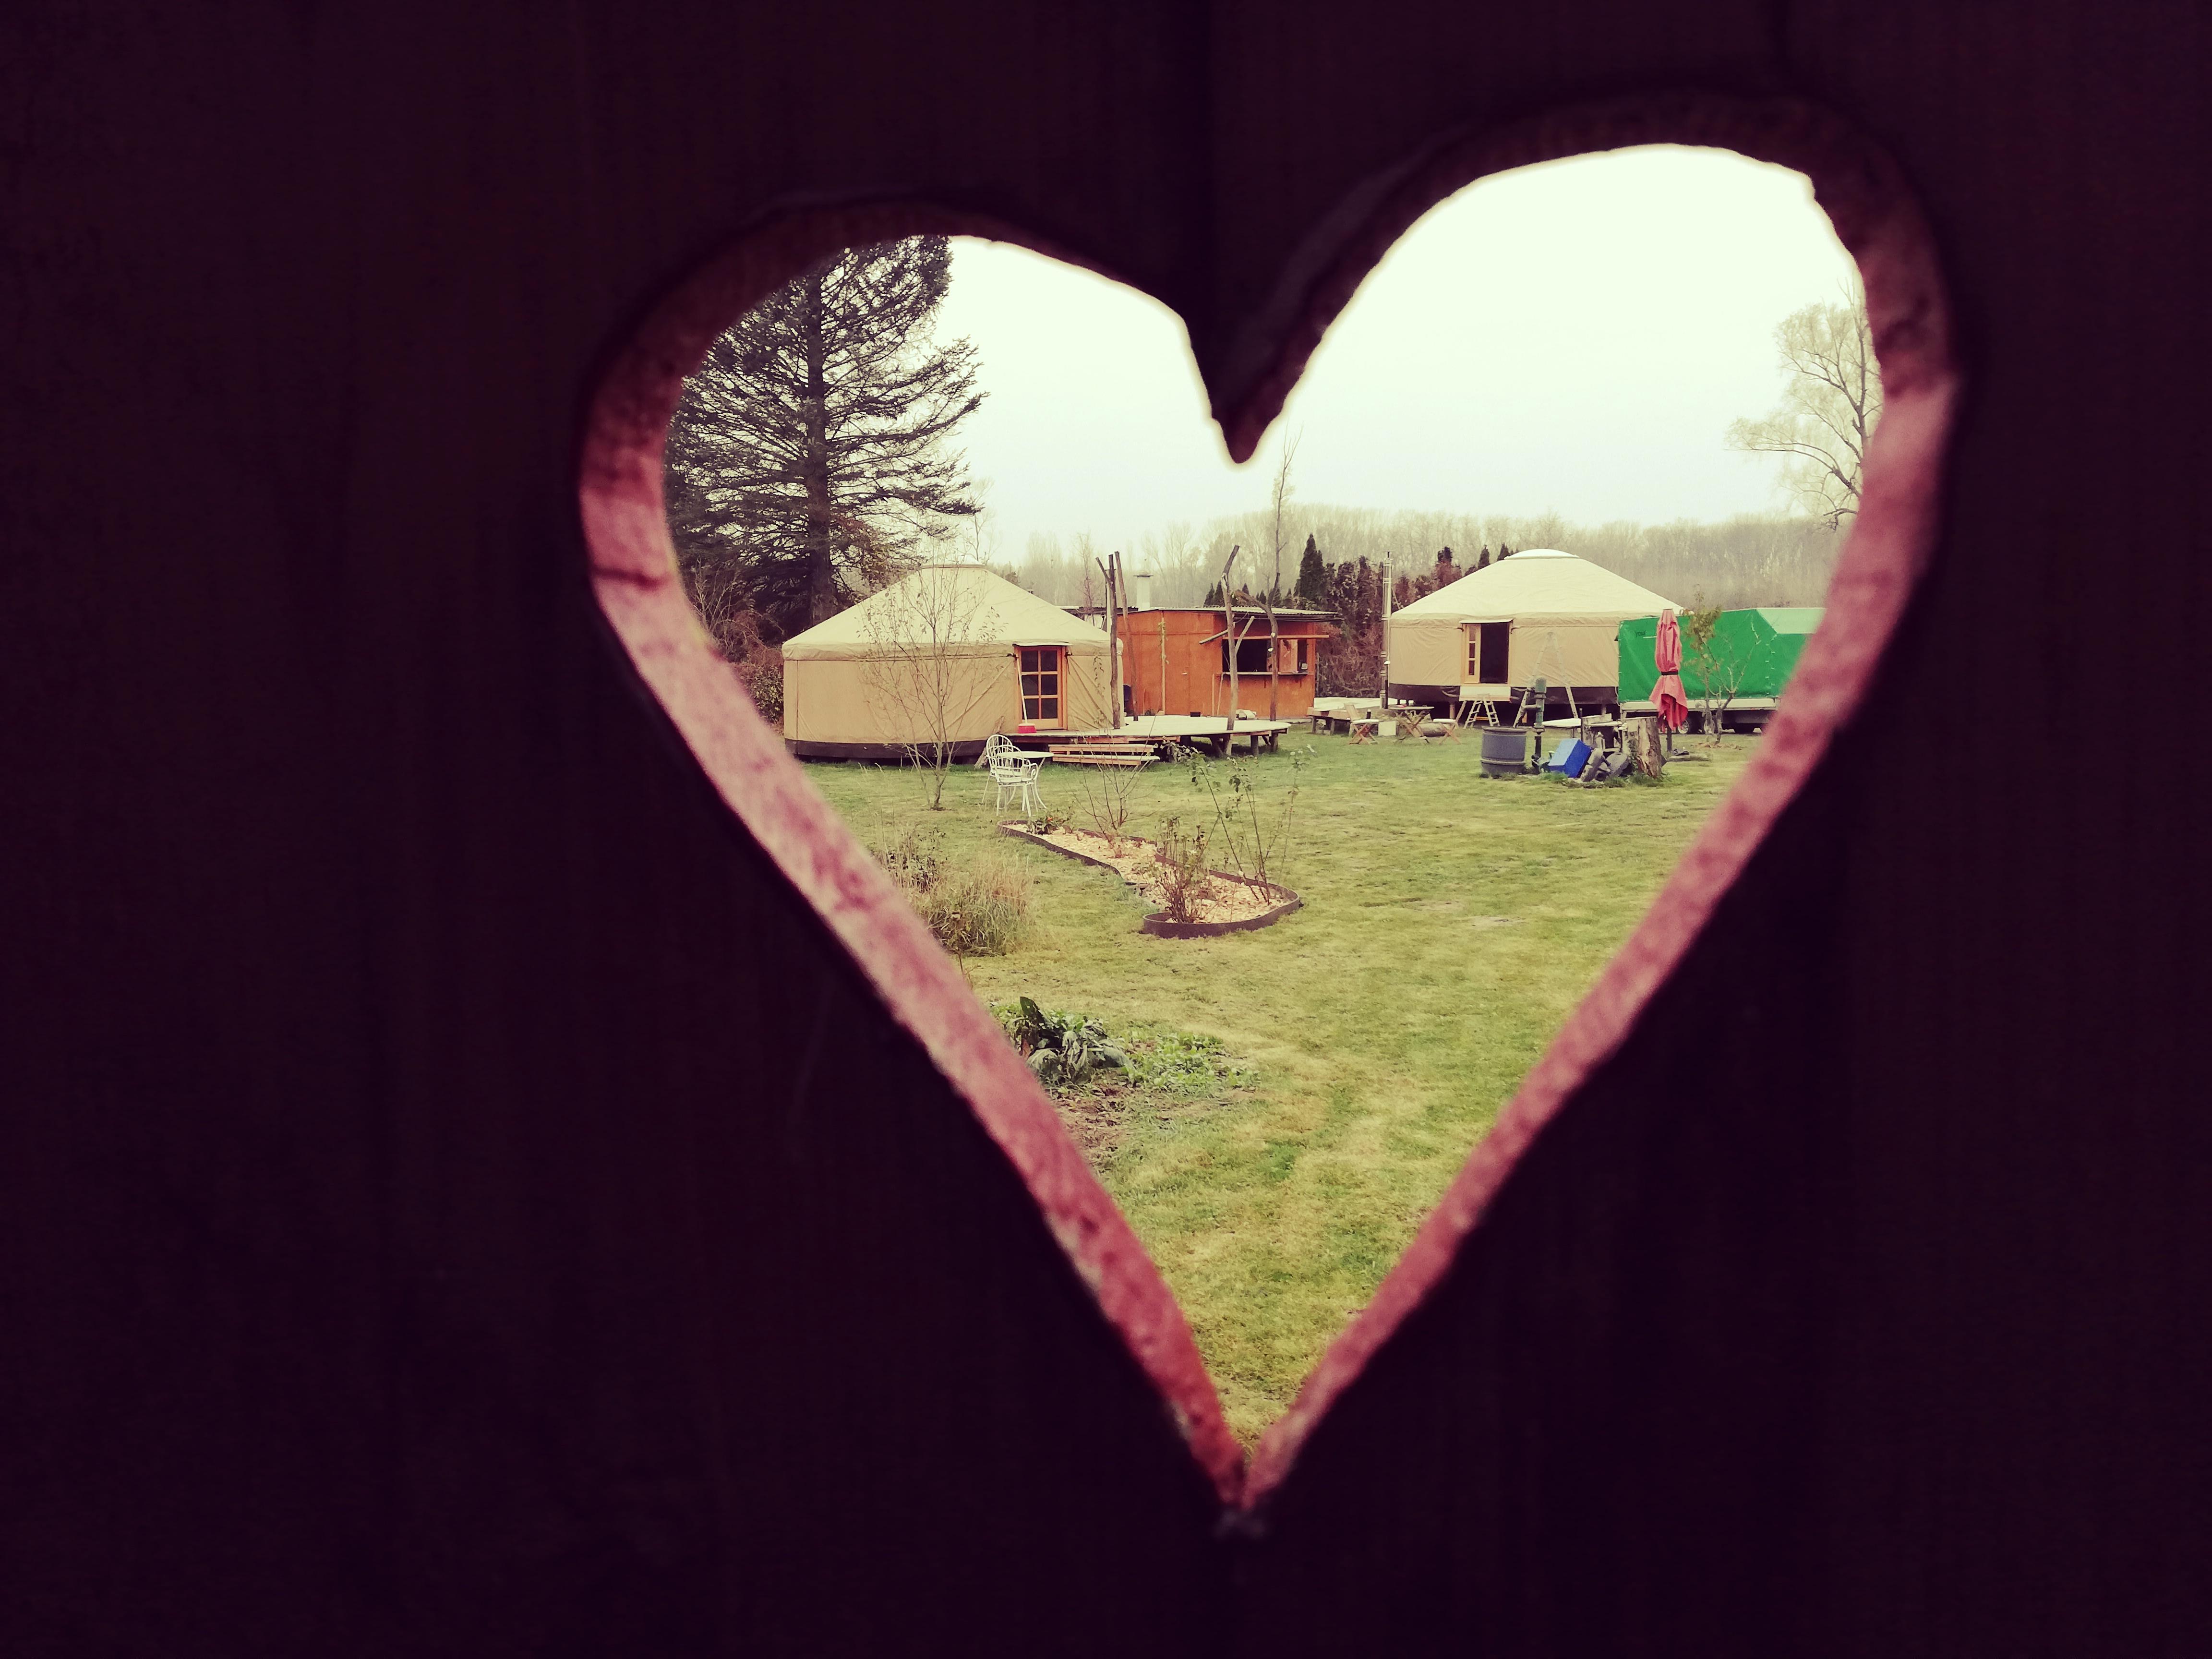 Reiki yurt and Zenbodytherapy